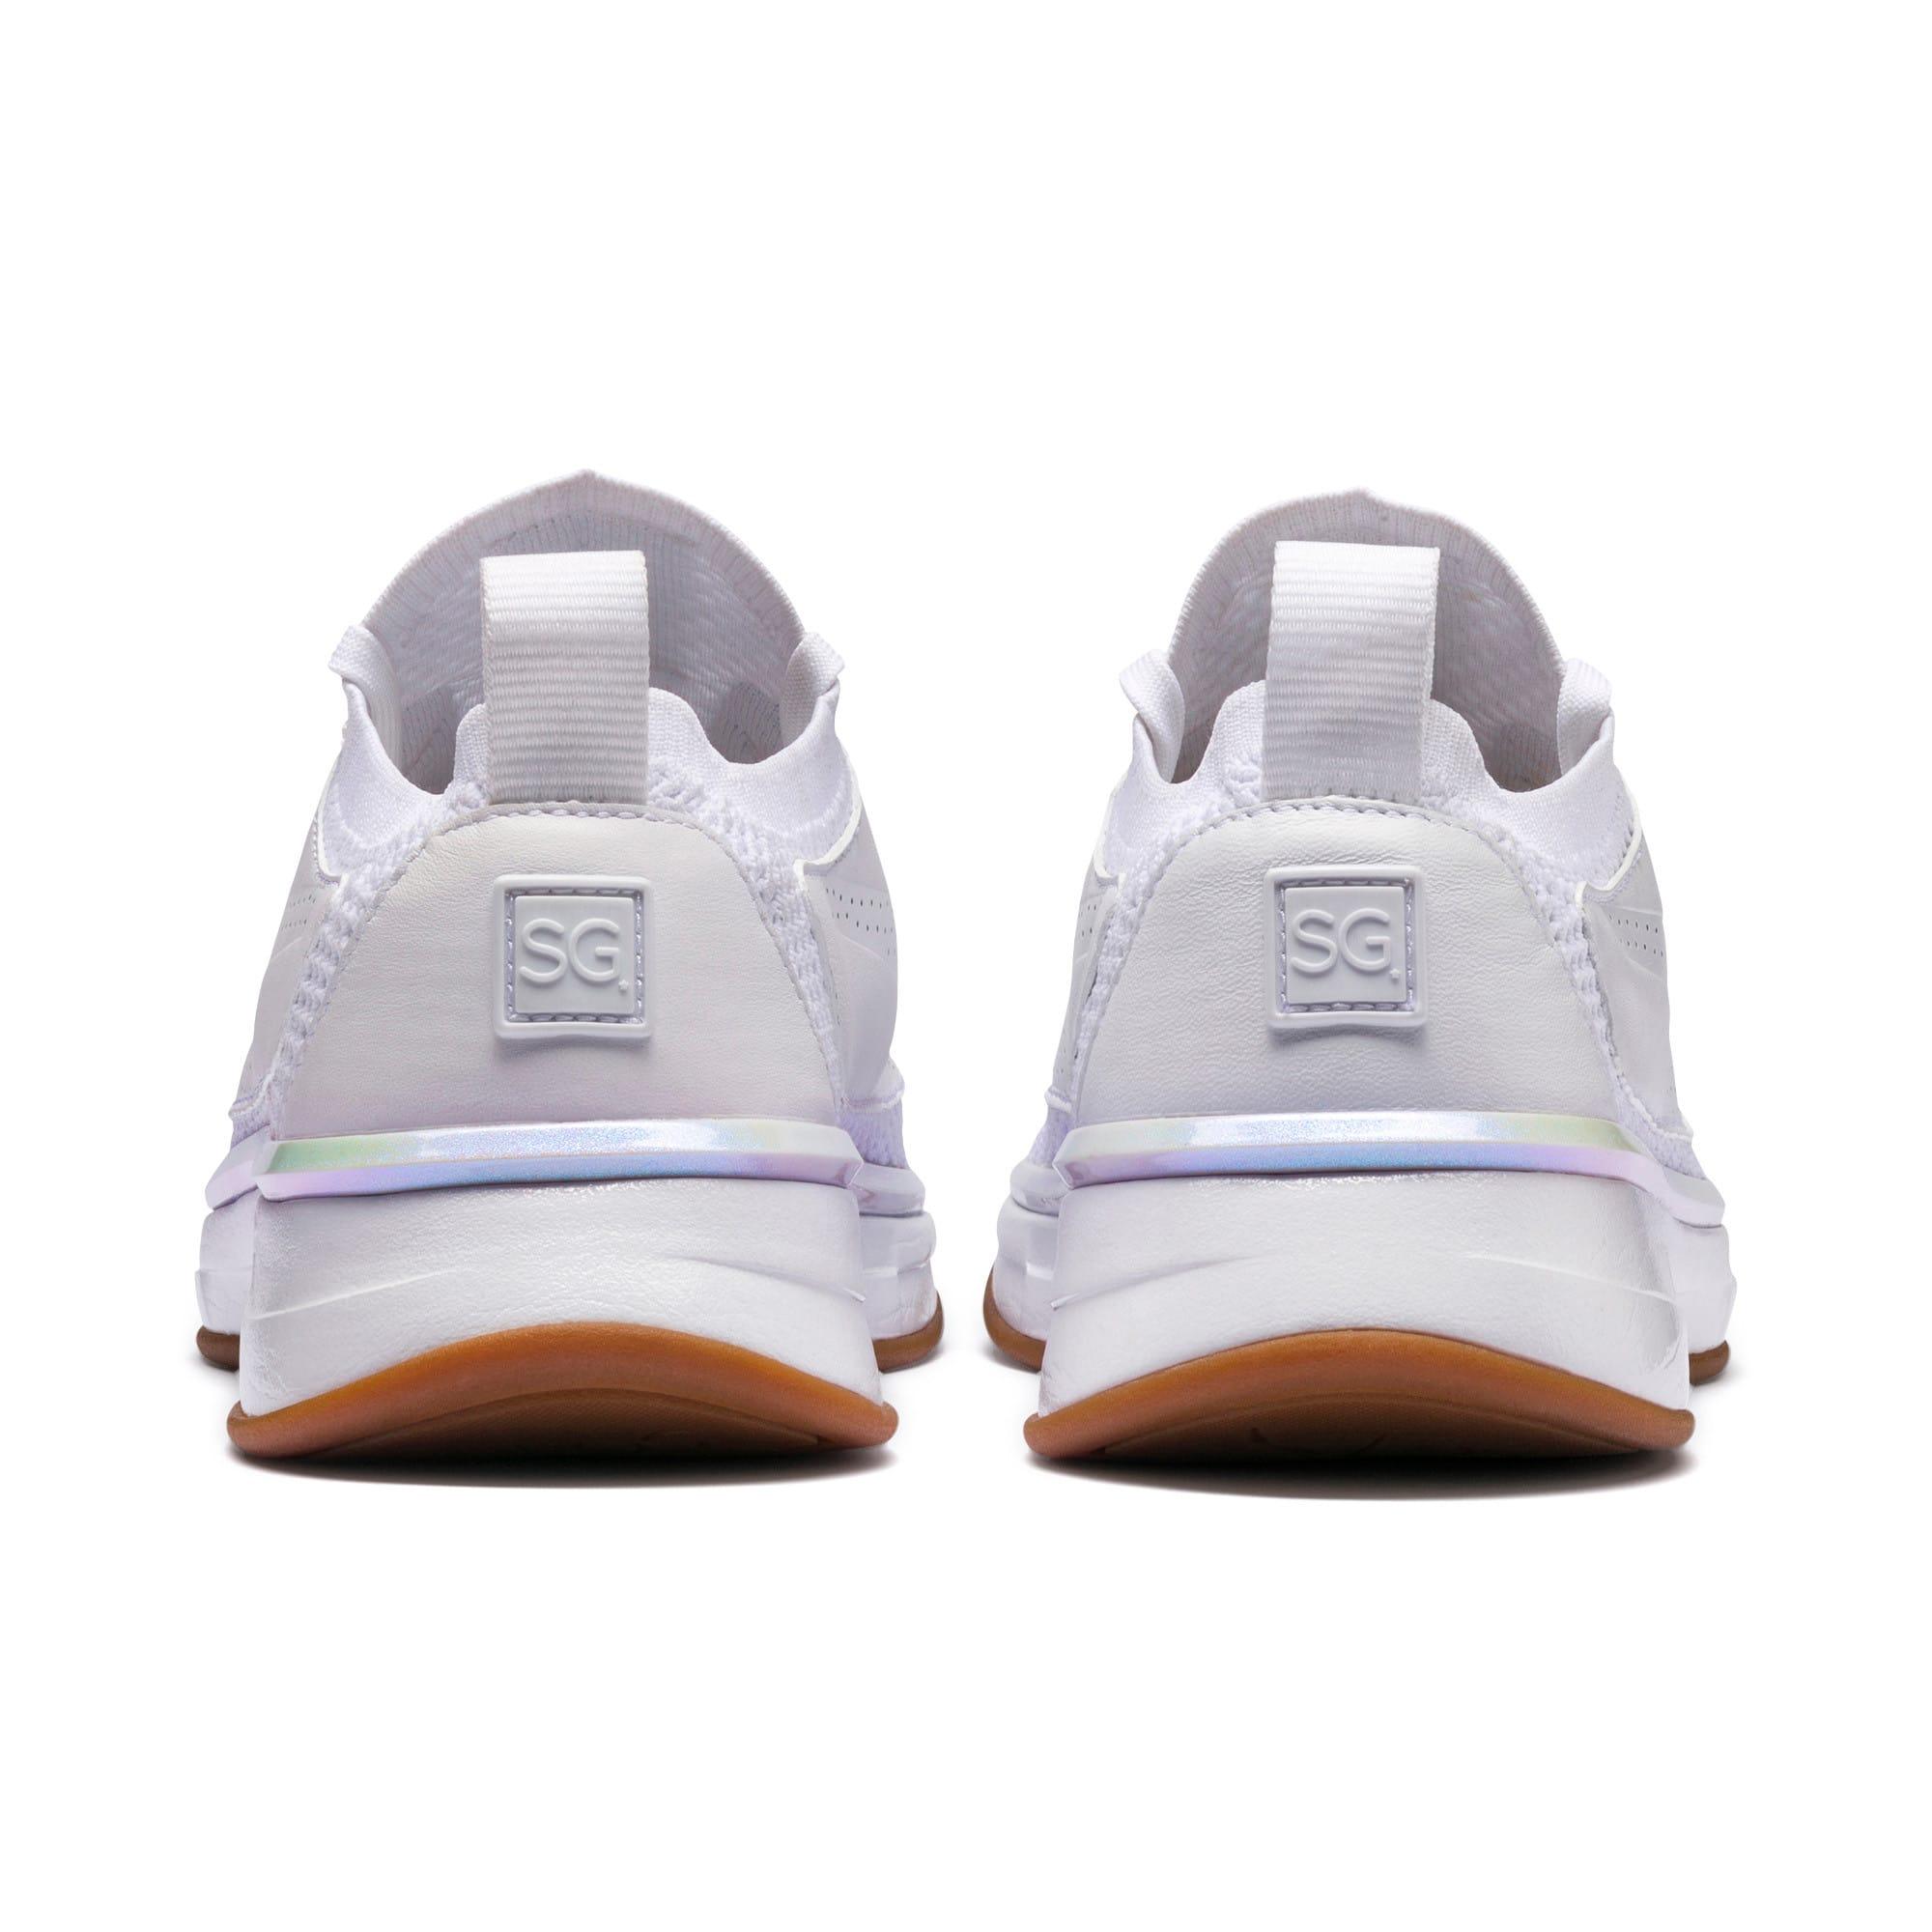 Thumbnail 2 of PUMA x SELENA GOMEZ Runner Women's Training Shoes, Puma White, medium-IND